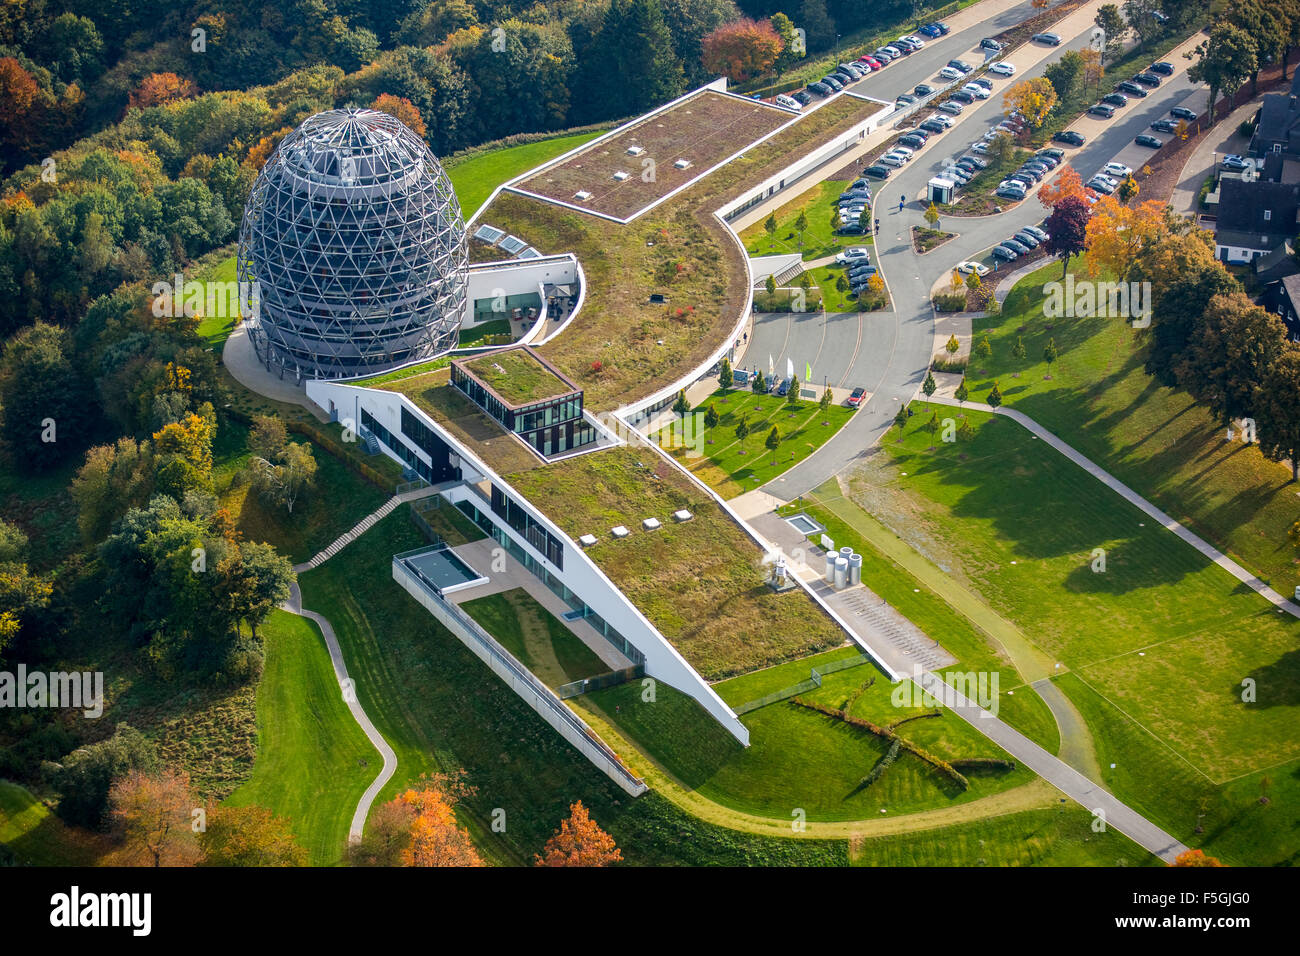 Oversum Vital Resort and tourist information, Winterberg, Sauerland, North Rhine-Westphalia, Germany - Stock Image